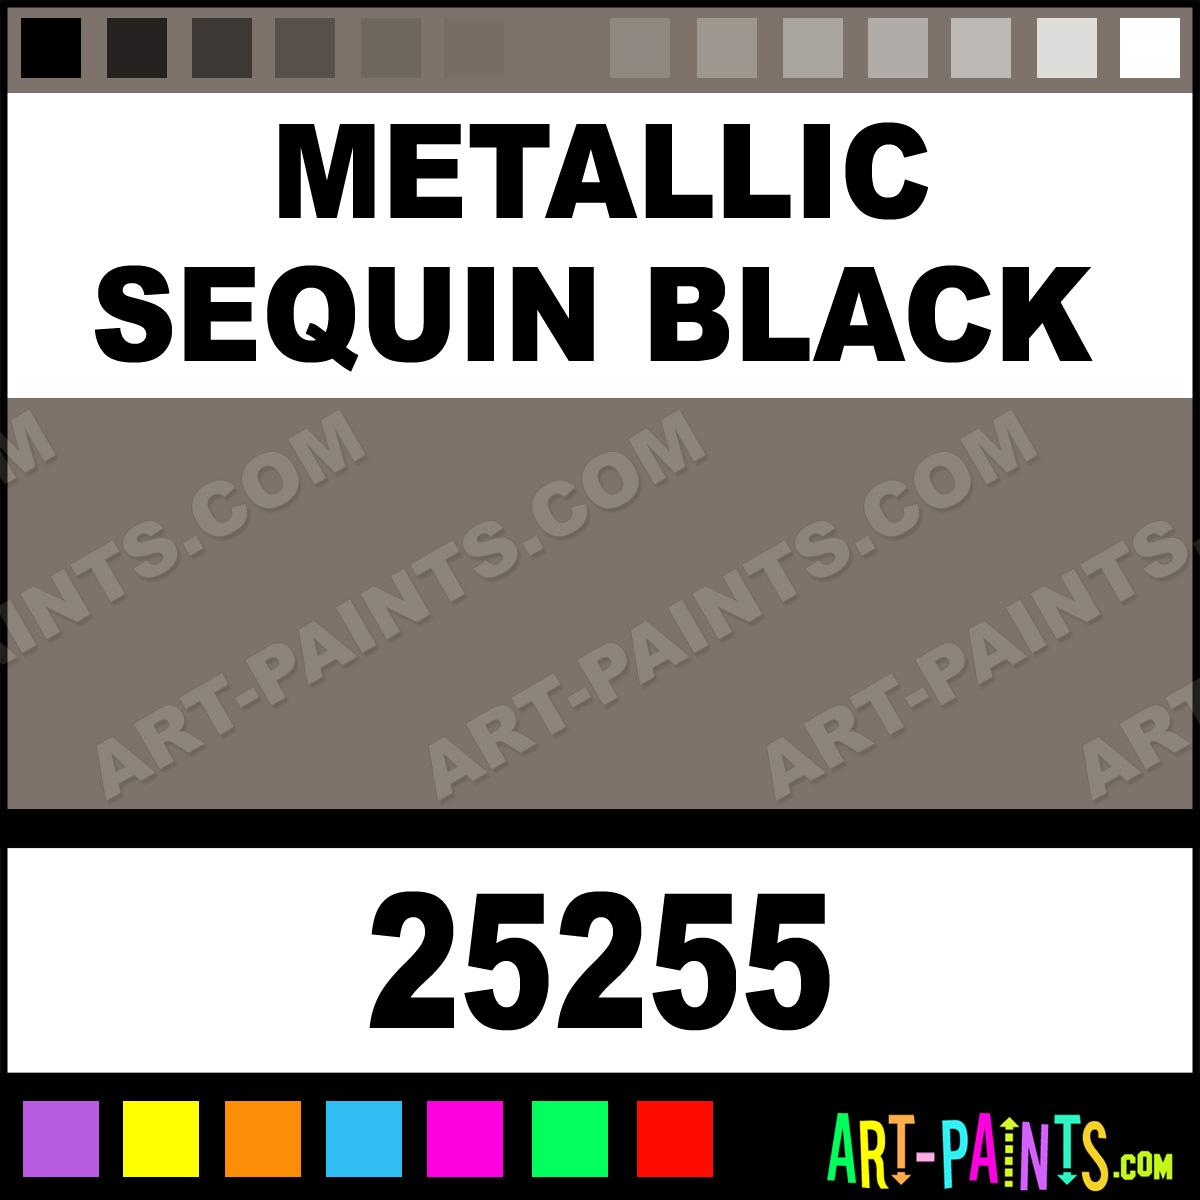 Plaid Fashion Dimensional Fabric Paint Metallic Sequin Black